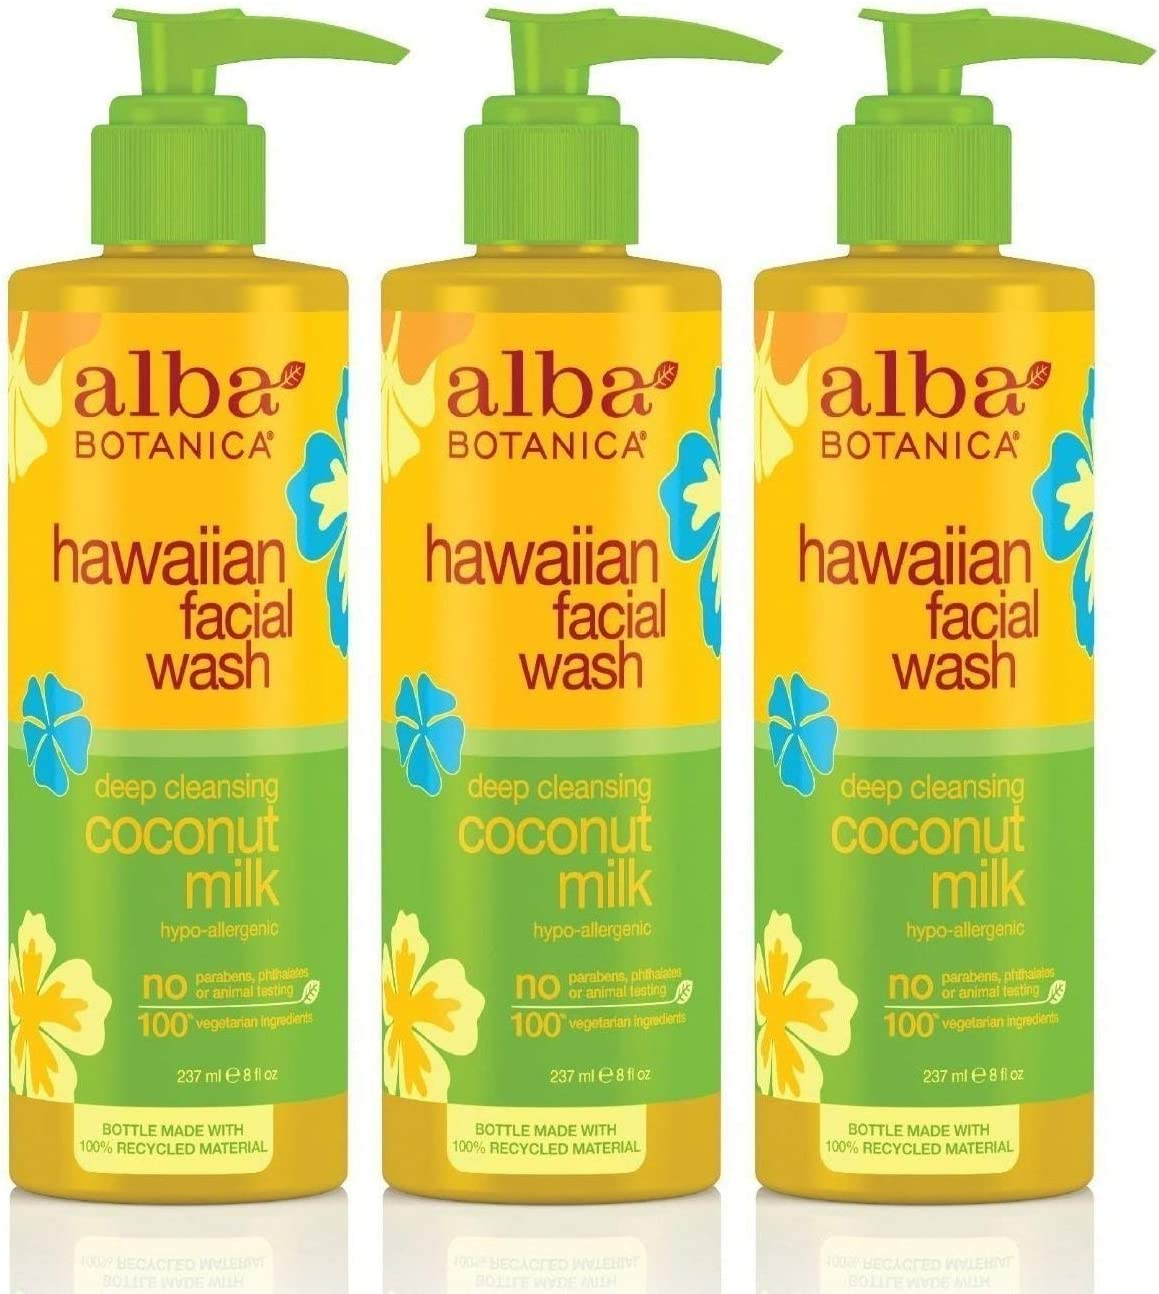 Alba Botanica Hawaiian Coconut Milk Face Wash, 8 Ounce - 3 per case.